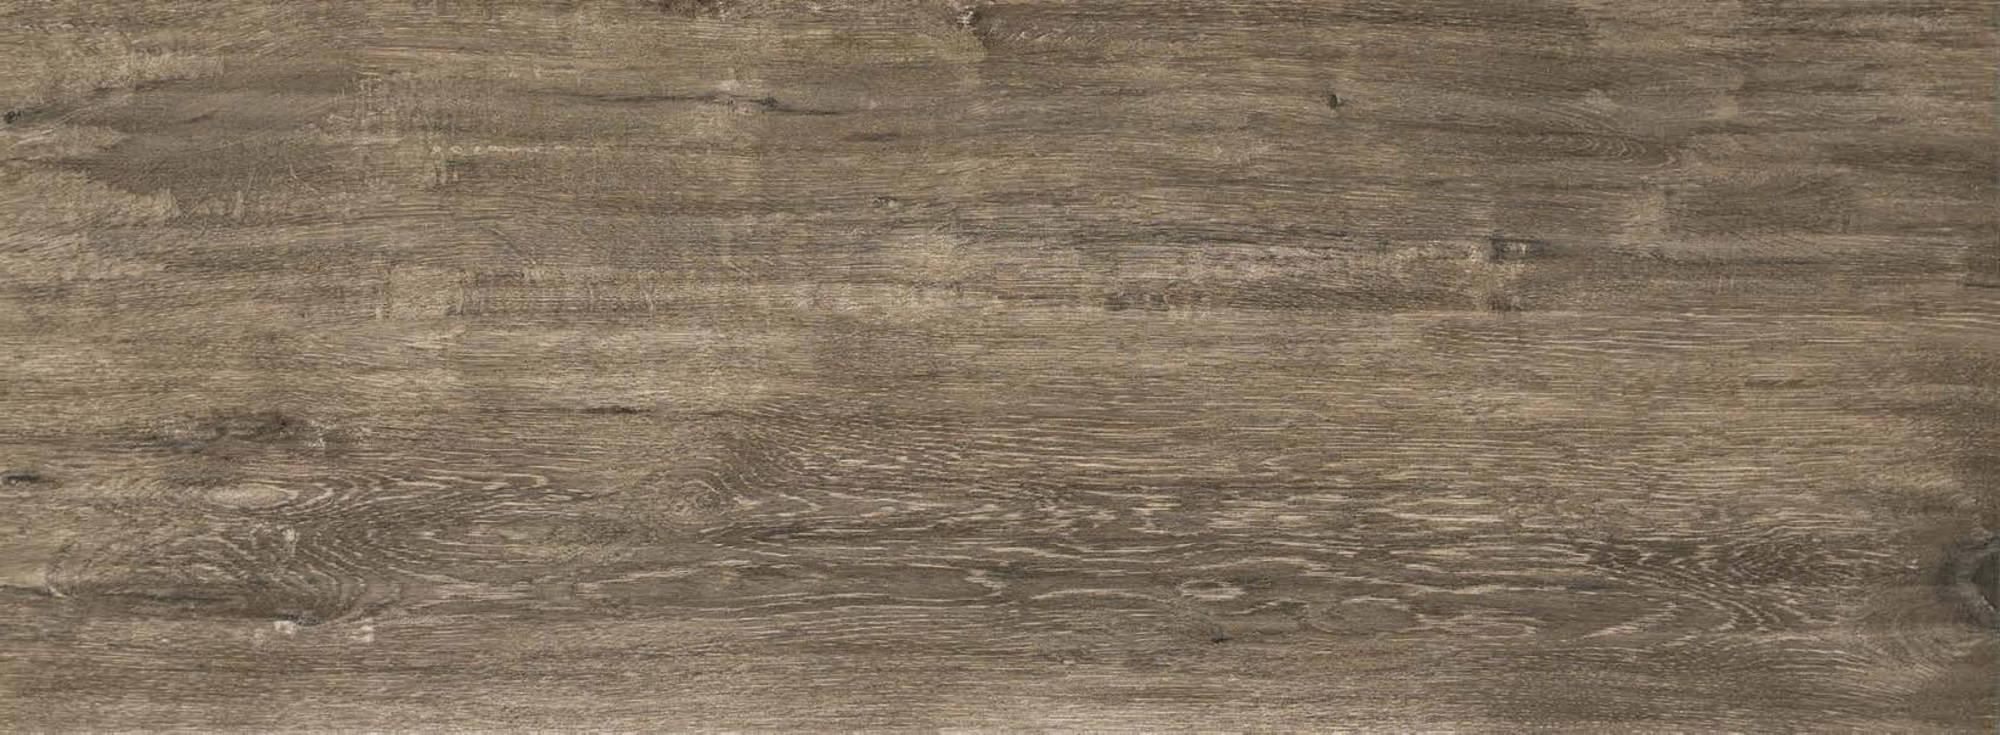 Vloertegel Dom Ceramiche Logwood 24,8x99,8x1,05 cm Taupe 1M2